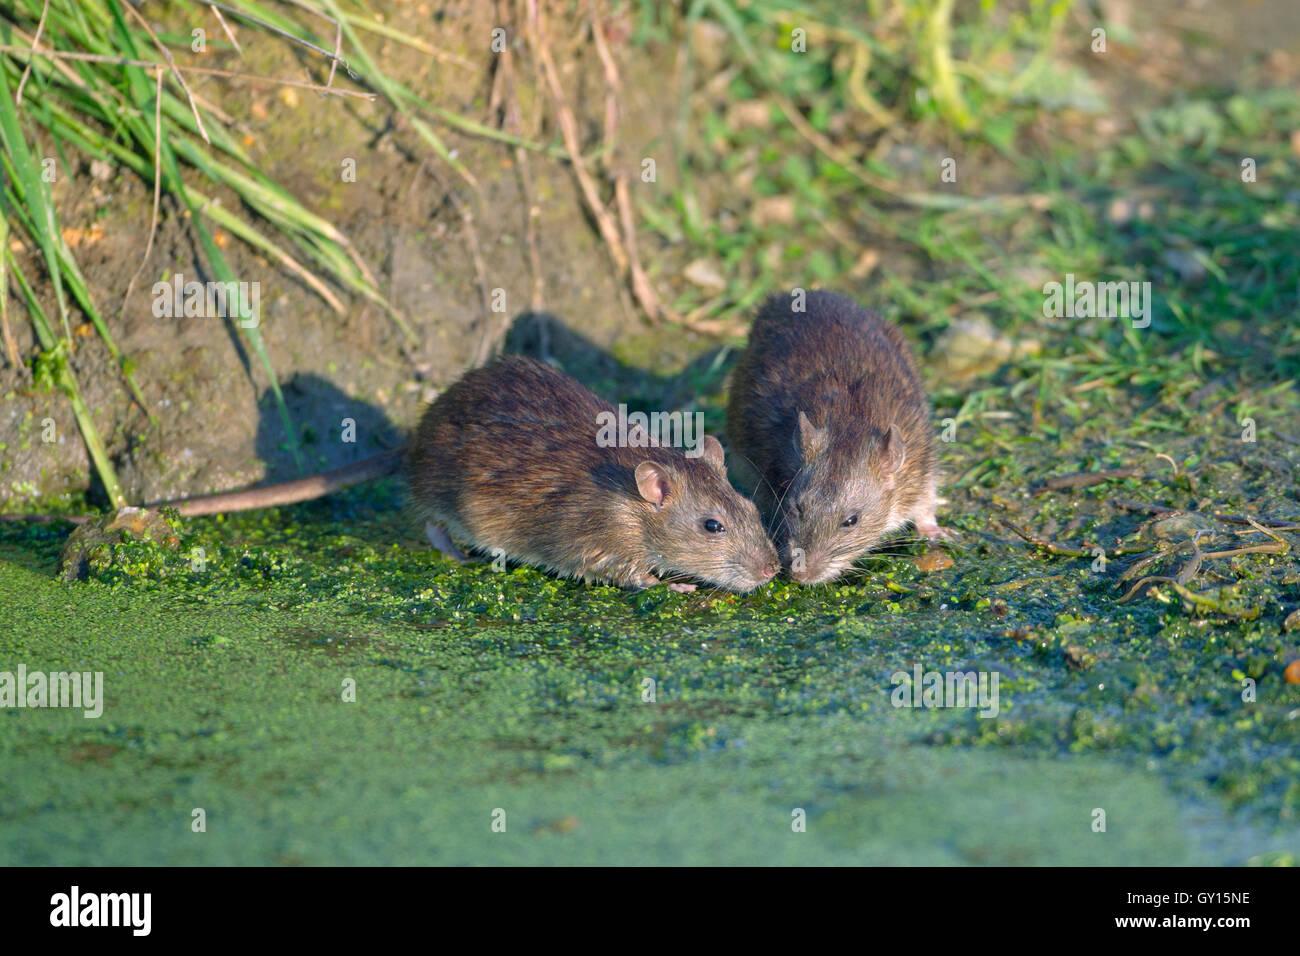 Braune Ratten Rattus Norvegicus Fütterung Stockbild